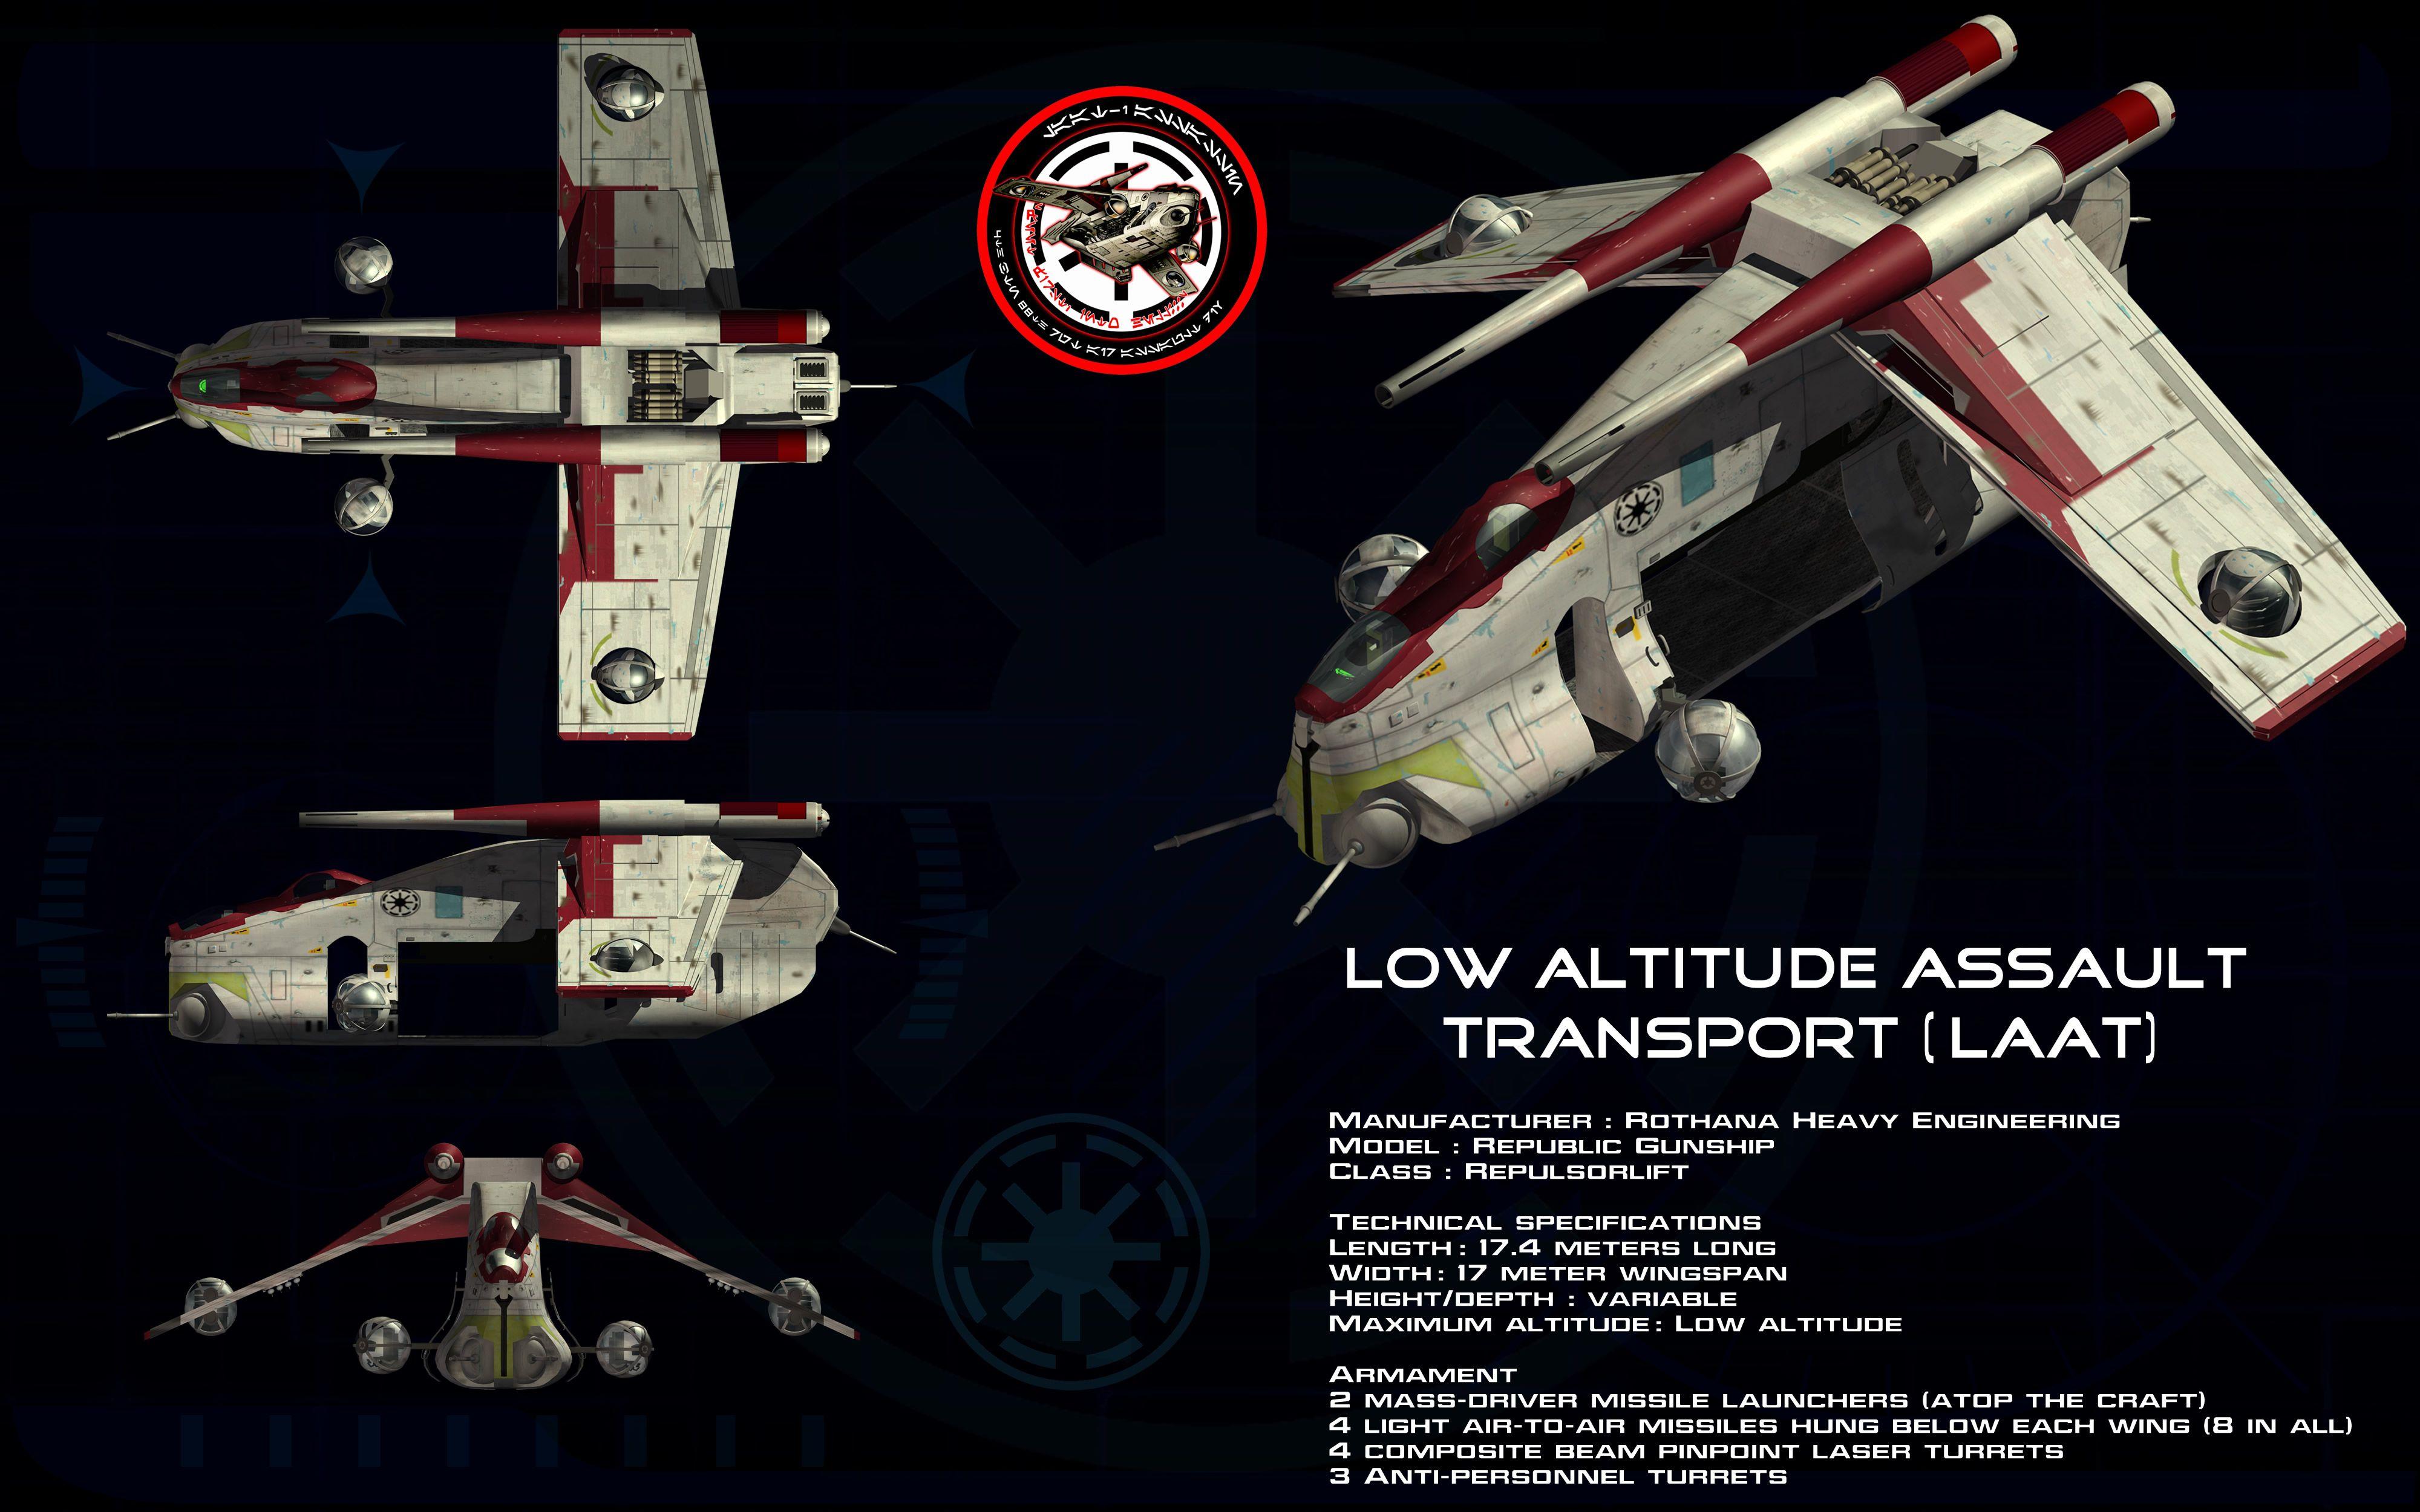 Low Altitude Assault Transport (LAAT) ortho by unusualsuspex on deviantART